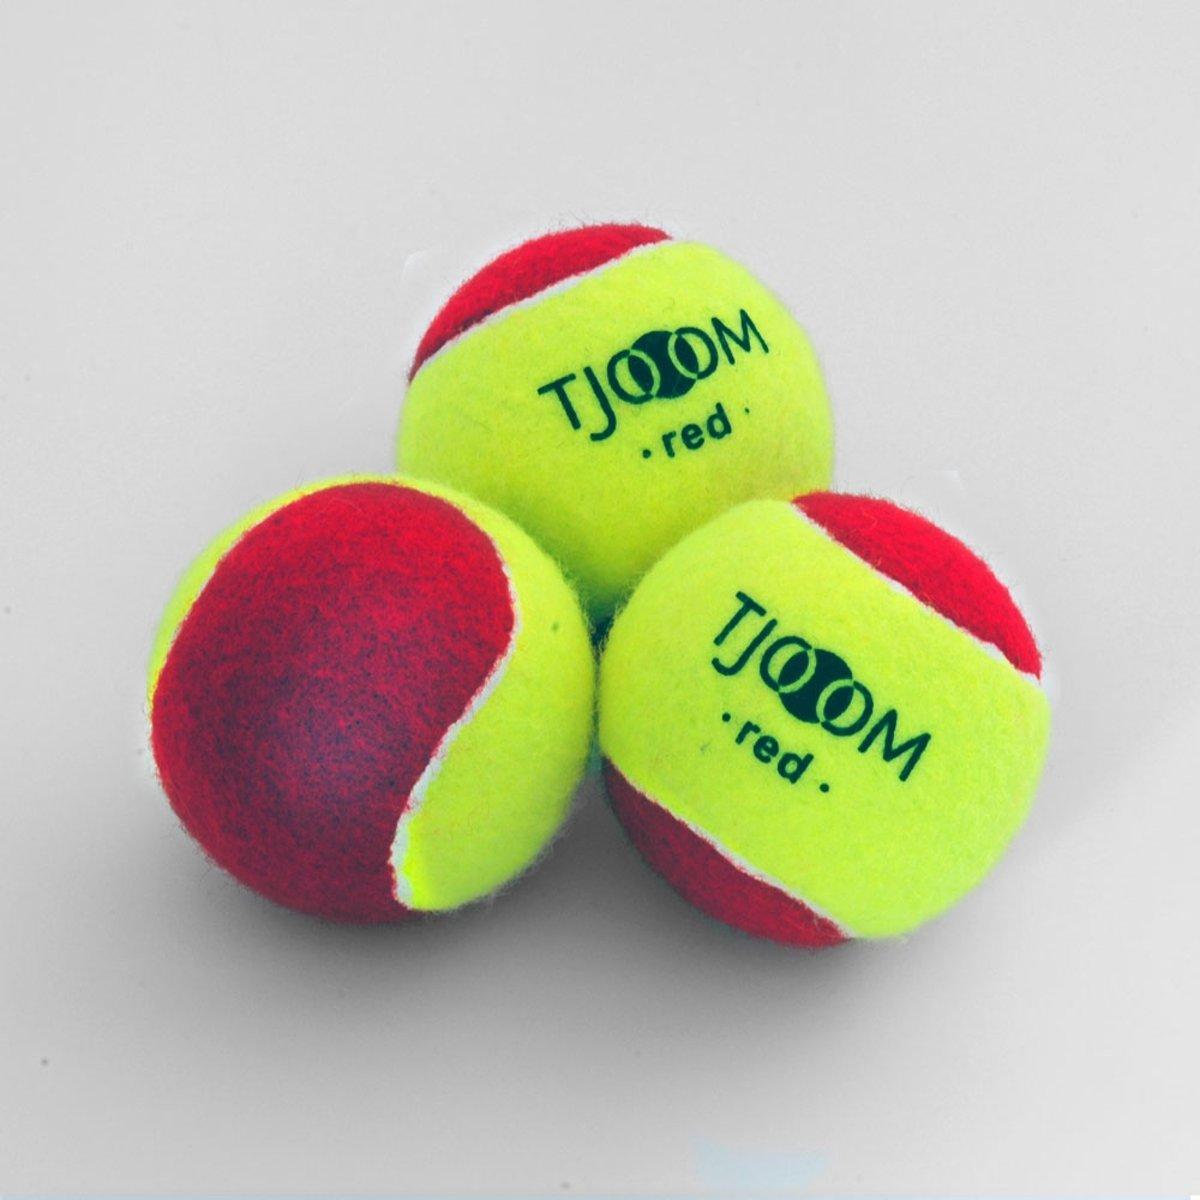 Tjoom red, stage 3 - Kidstennis - 60 ballen kopen